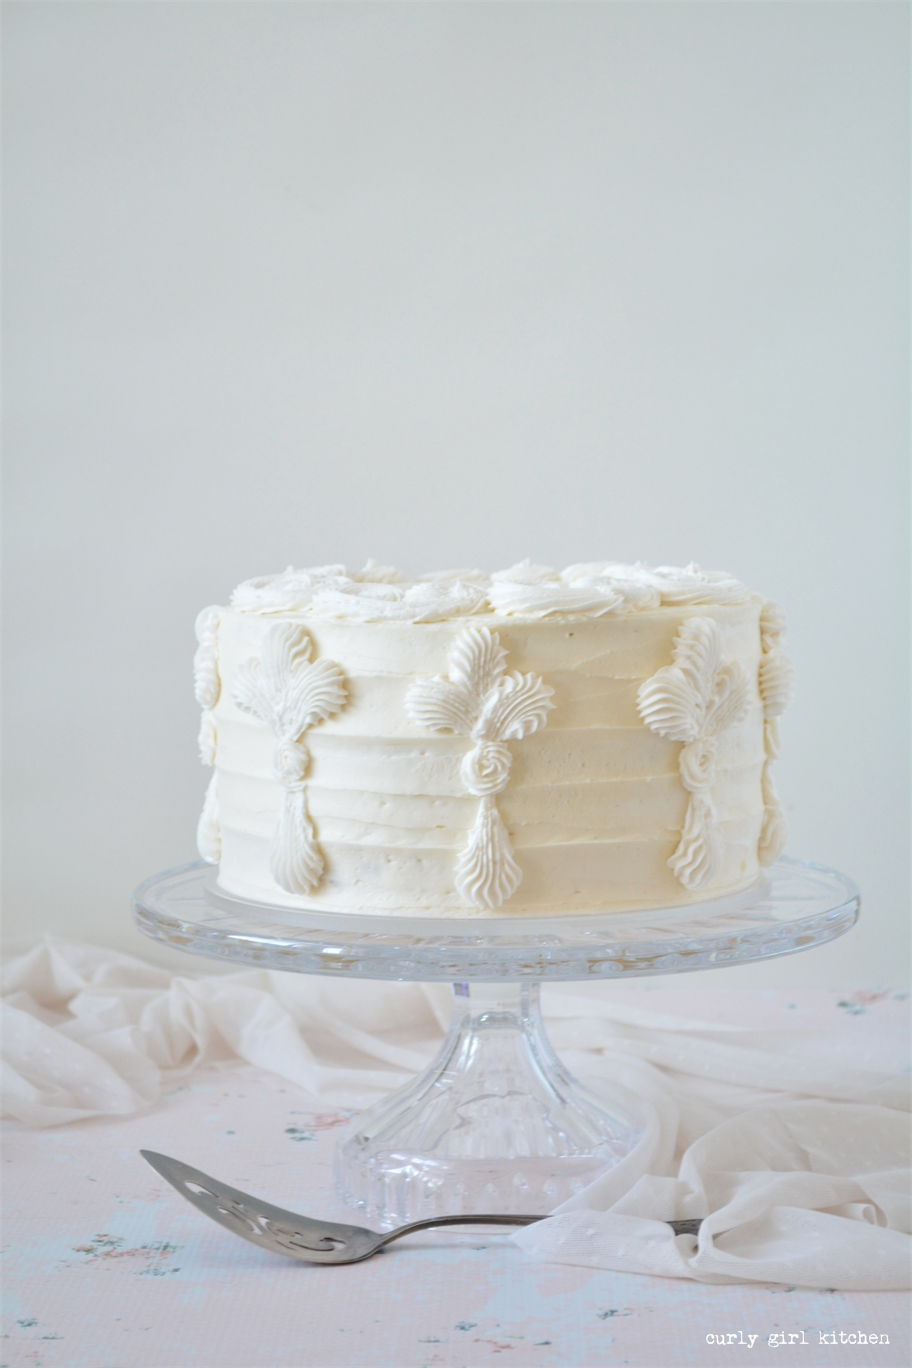 Curly Girl Kitchen Lemon Cake